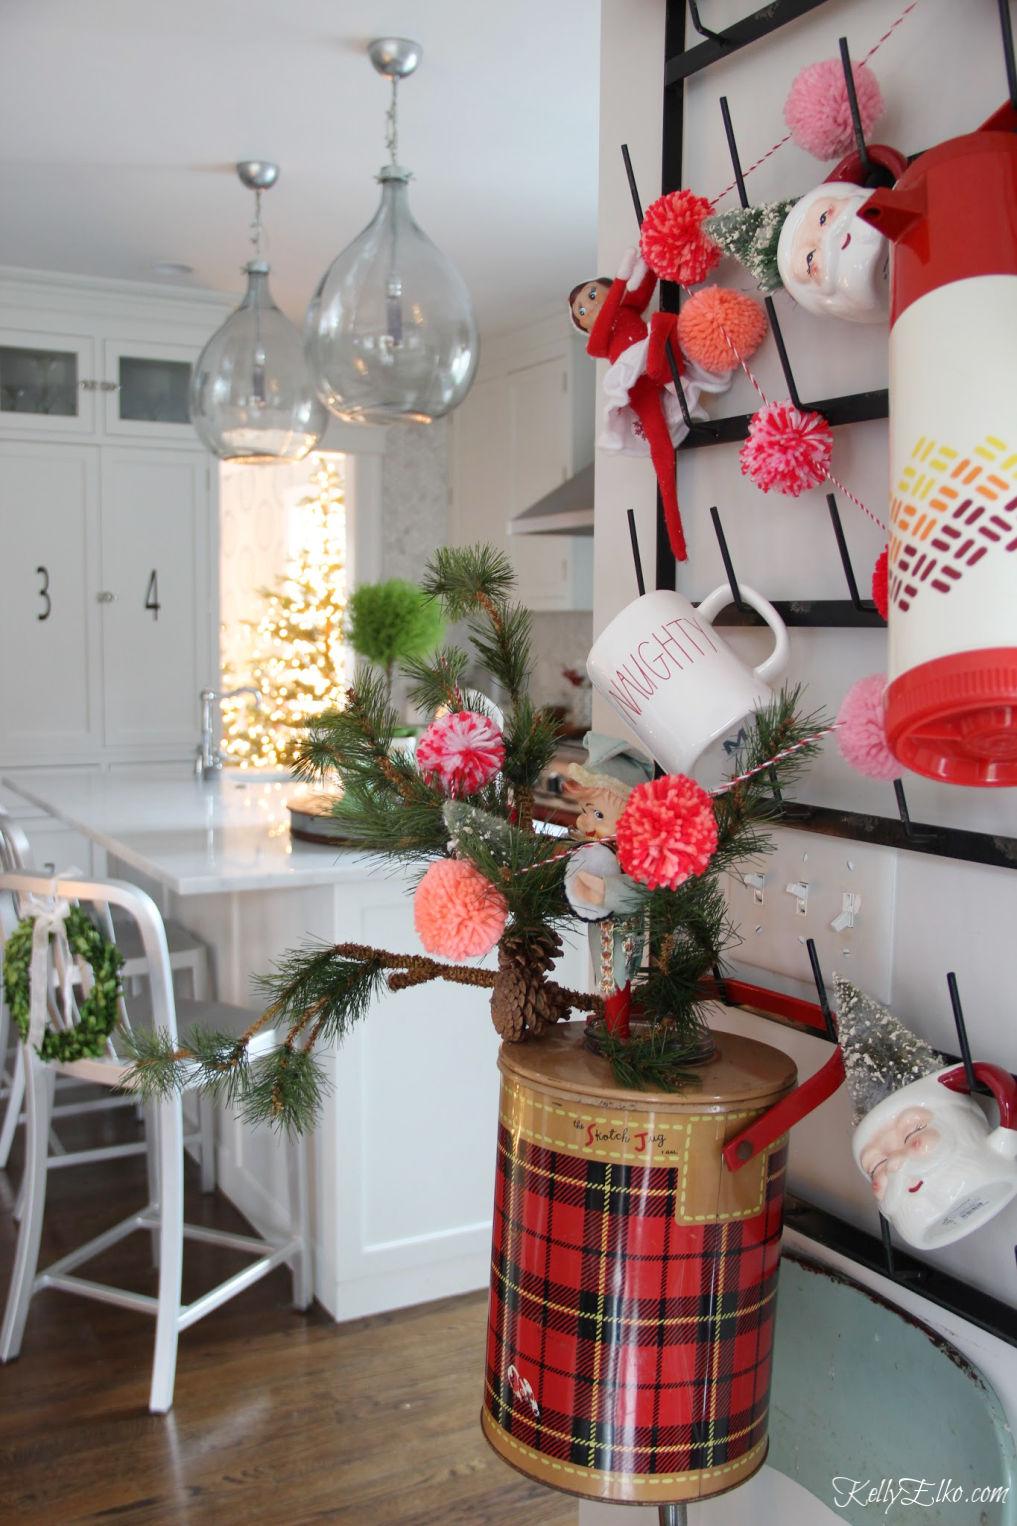 Colorful Christmas Home Tour - love this wall rack displaying vintage Christmas finds kellyelko.com #christmas #christmasdecor #christmasdecorating #christmashome #christmastour #diychristmas #christmasideas #christmasmantel #christmastree #christmasornaments #vintagechristmas #farmhousechristmas #colorfulchristmas #creativechristmas #kellyelko #vintagedecr #santamugs #santa #elves #christmaskitchen